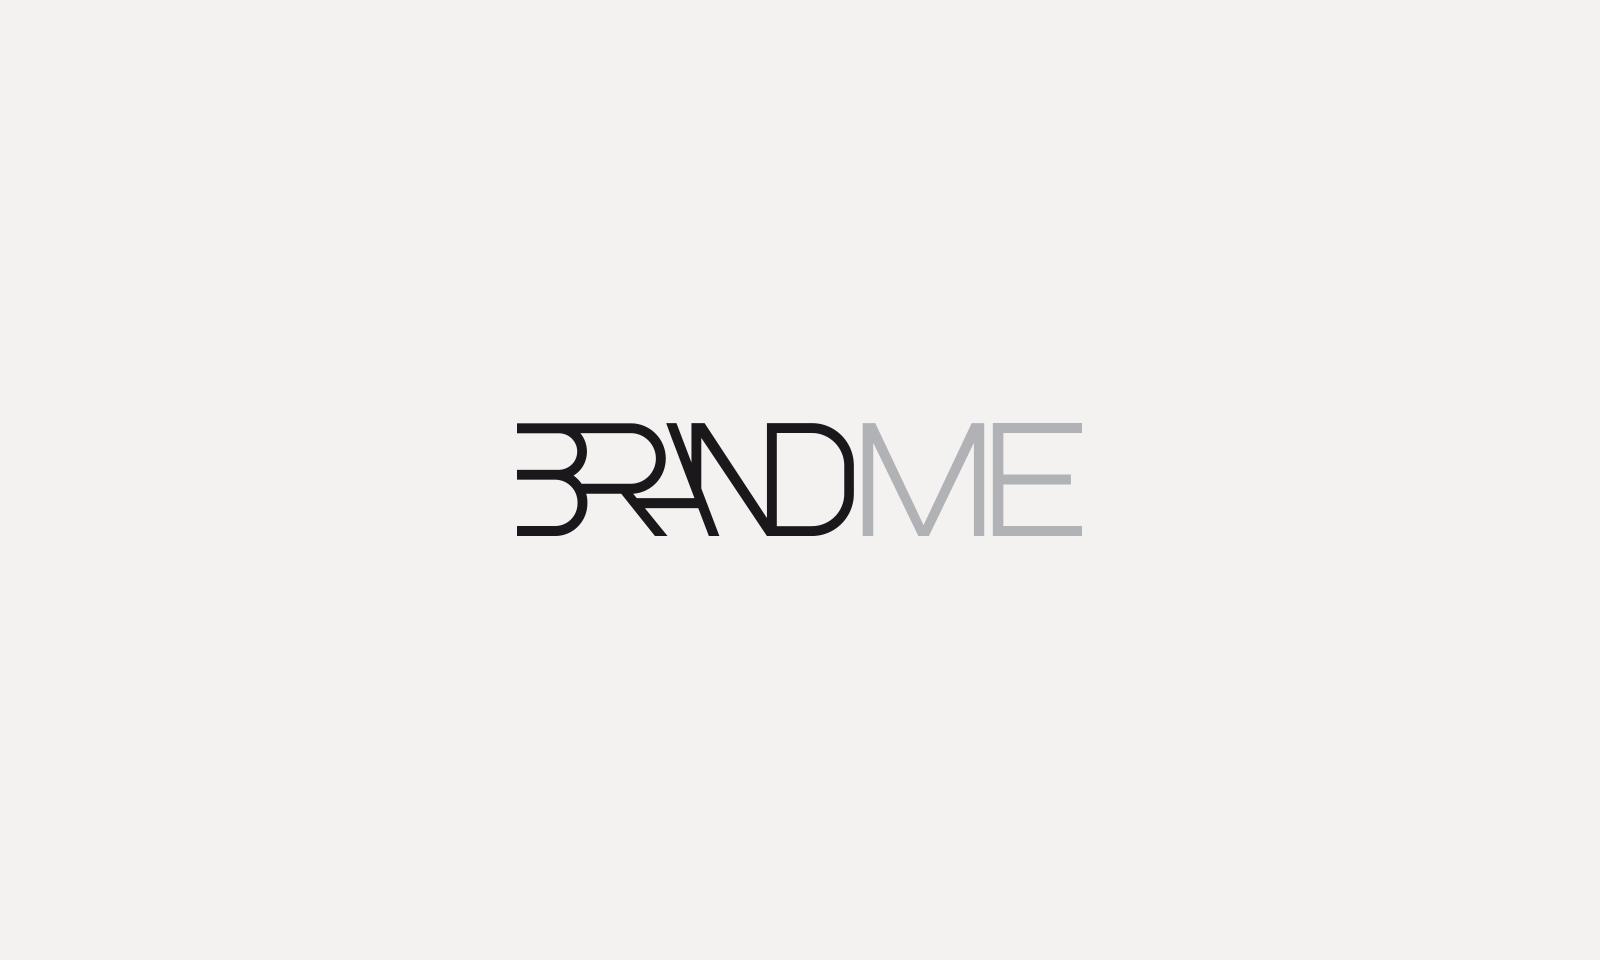 Logo Brand Me | Design Rossomura